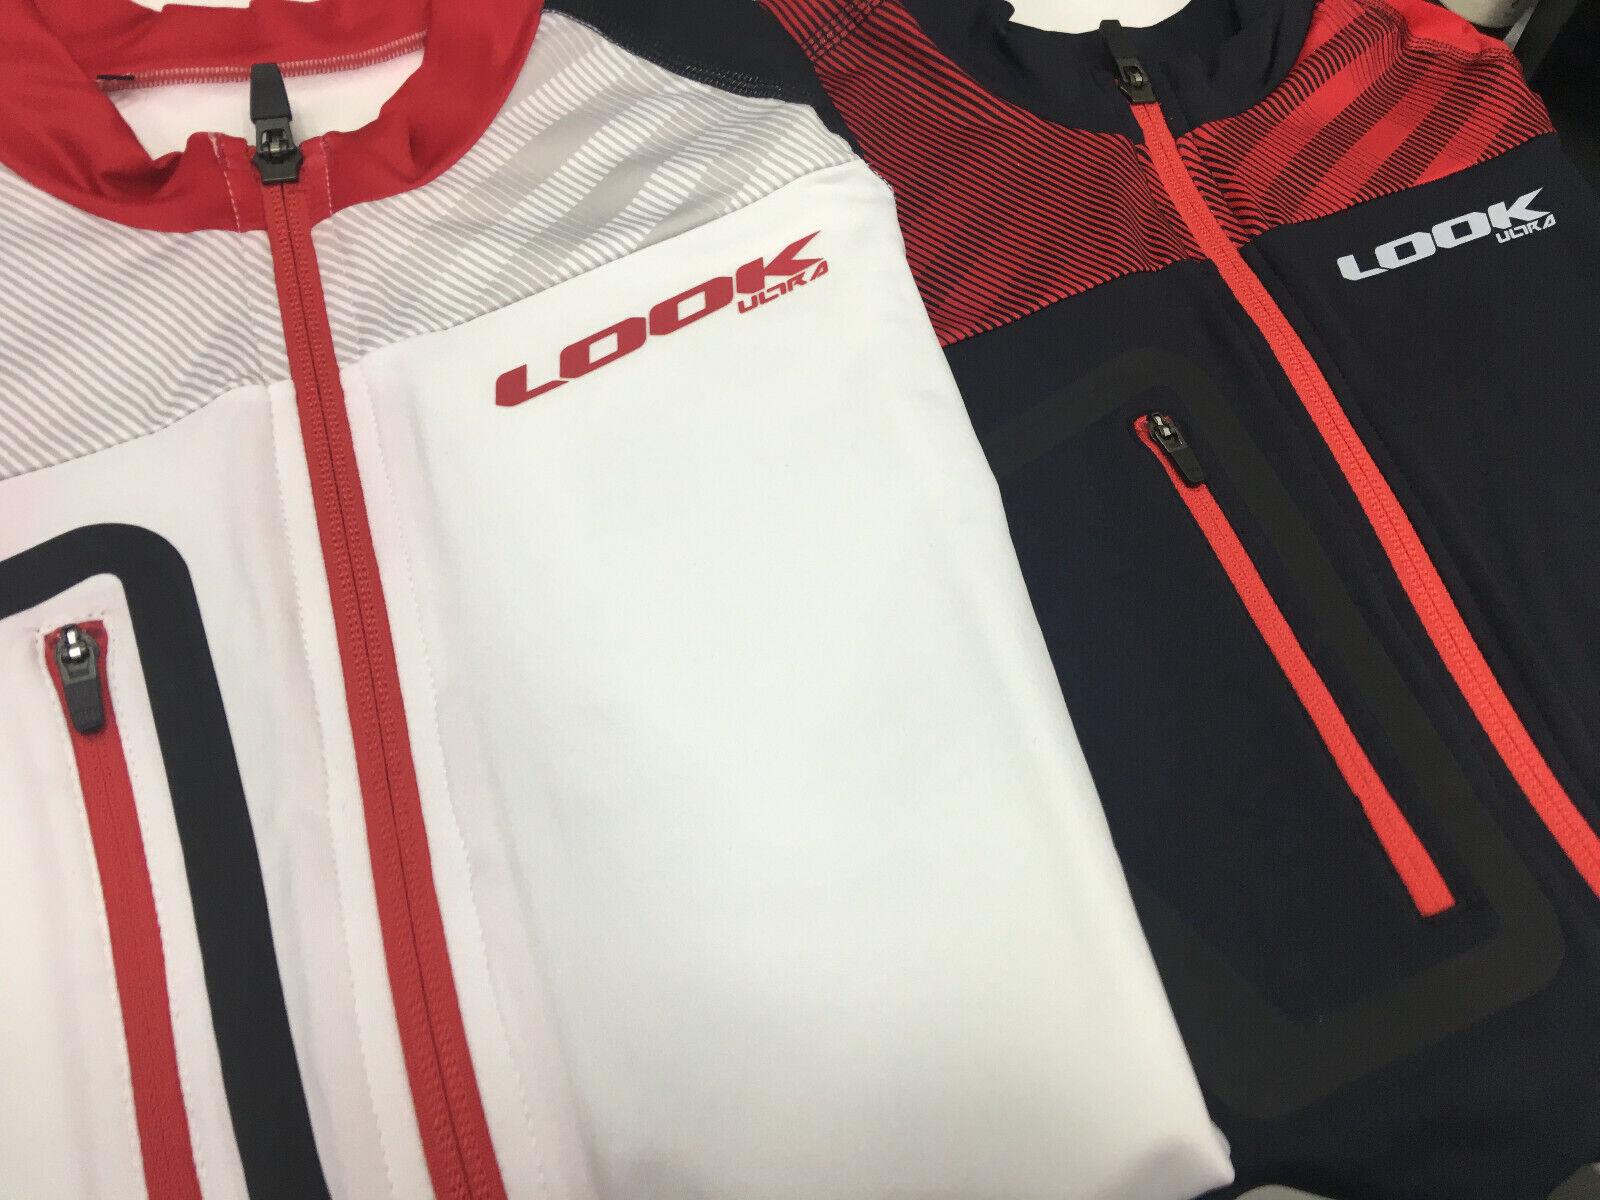 Mira maillot Ultra Manga Corta Camiseta De Ciclismo Para Hombre Talla M (negro blancoo-rojo)